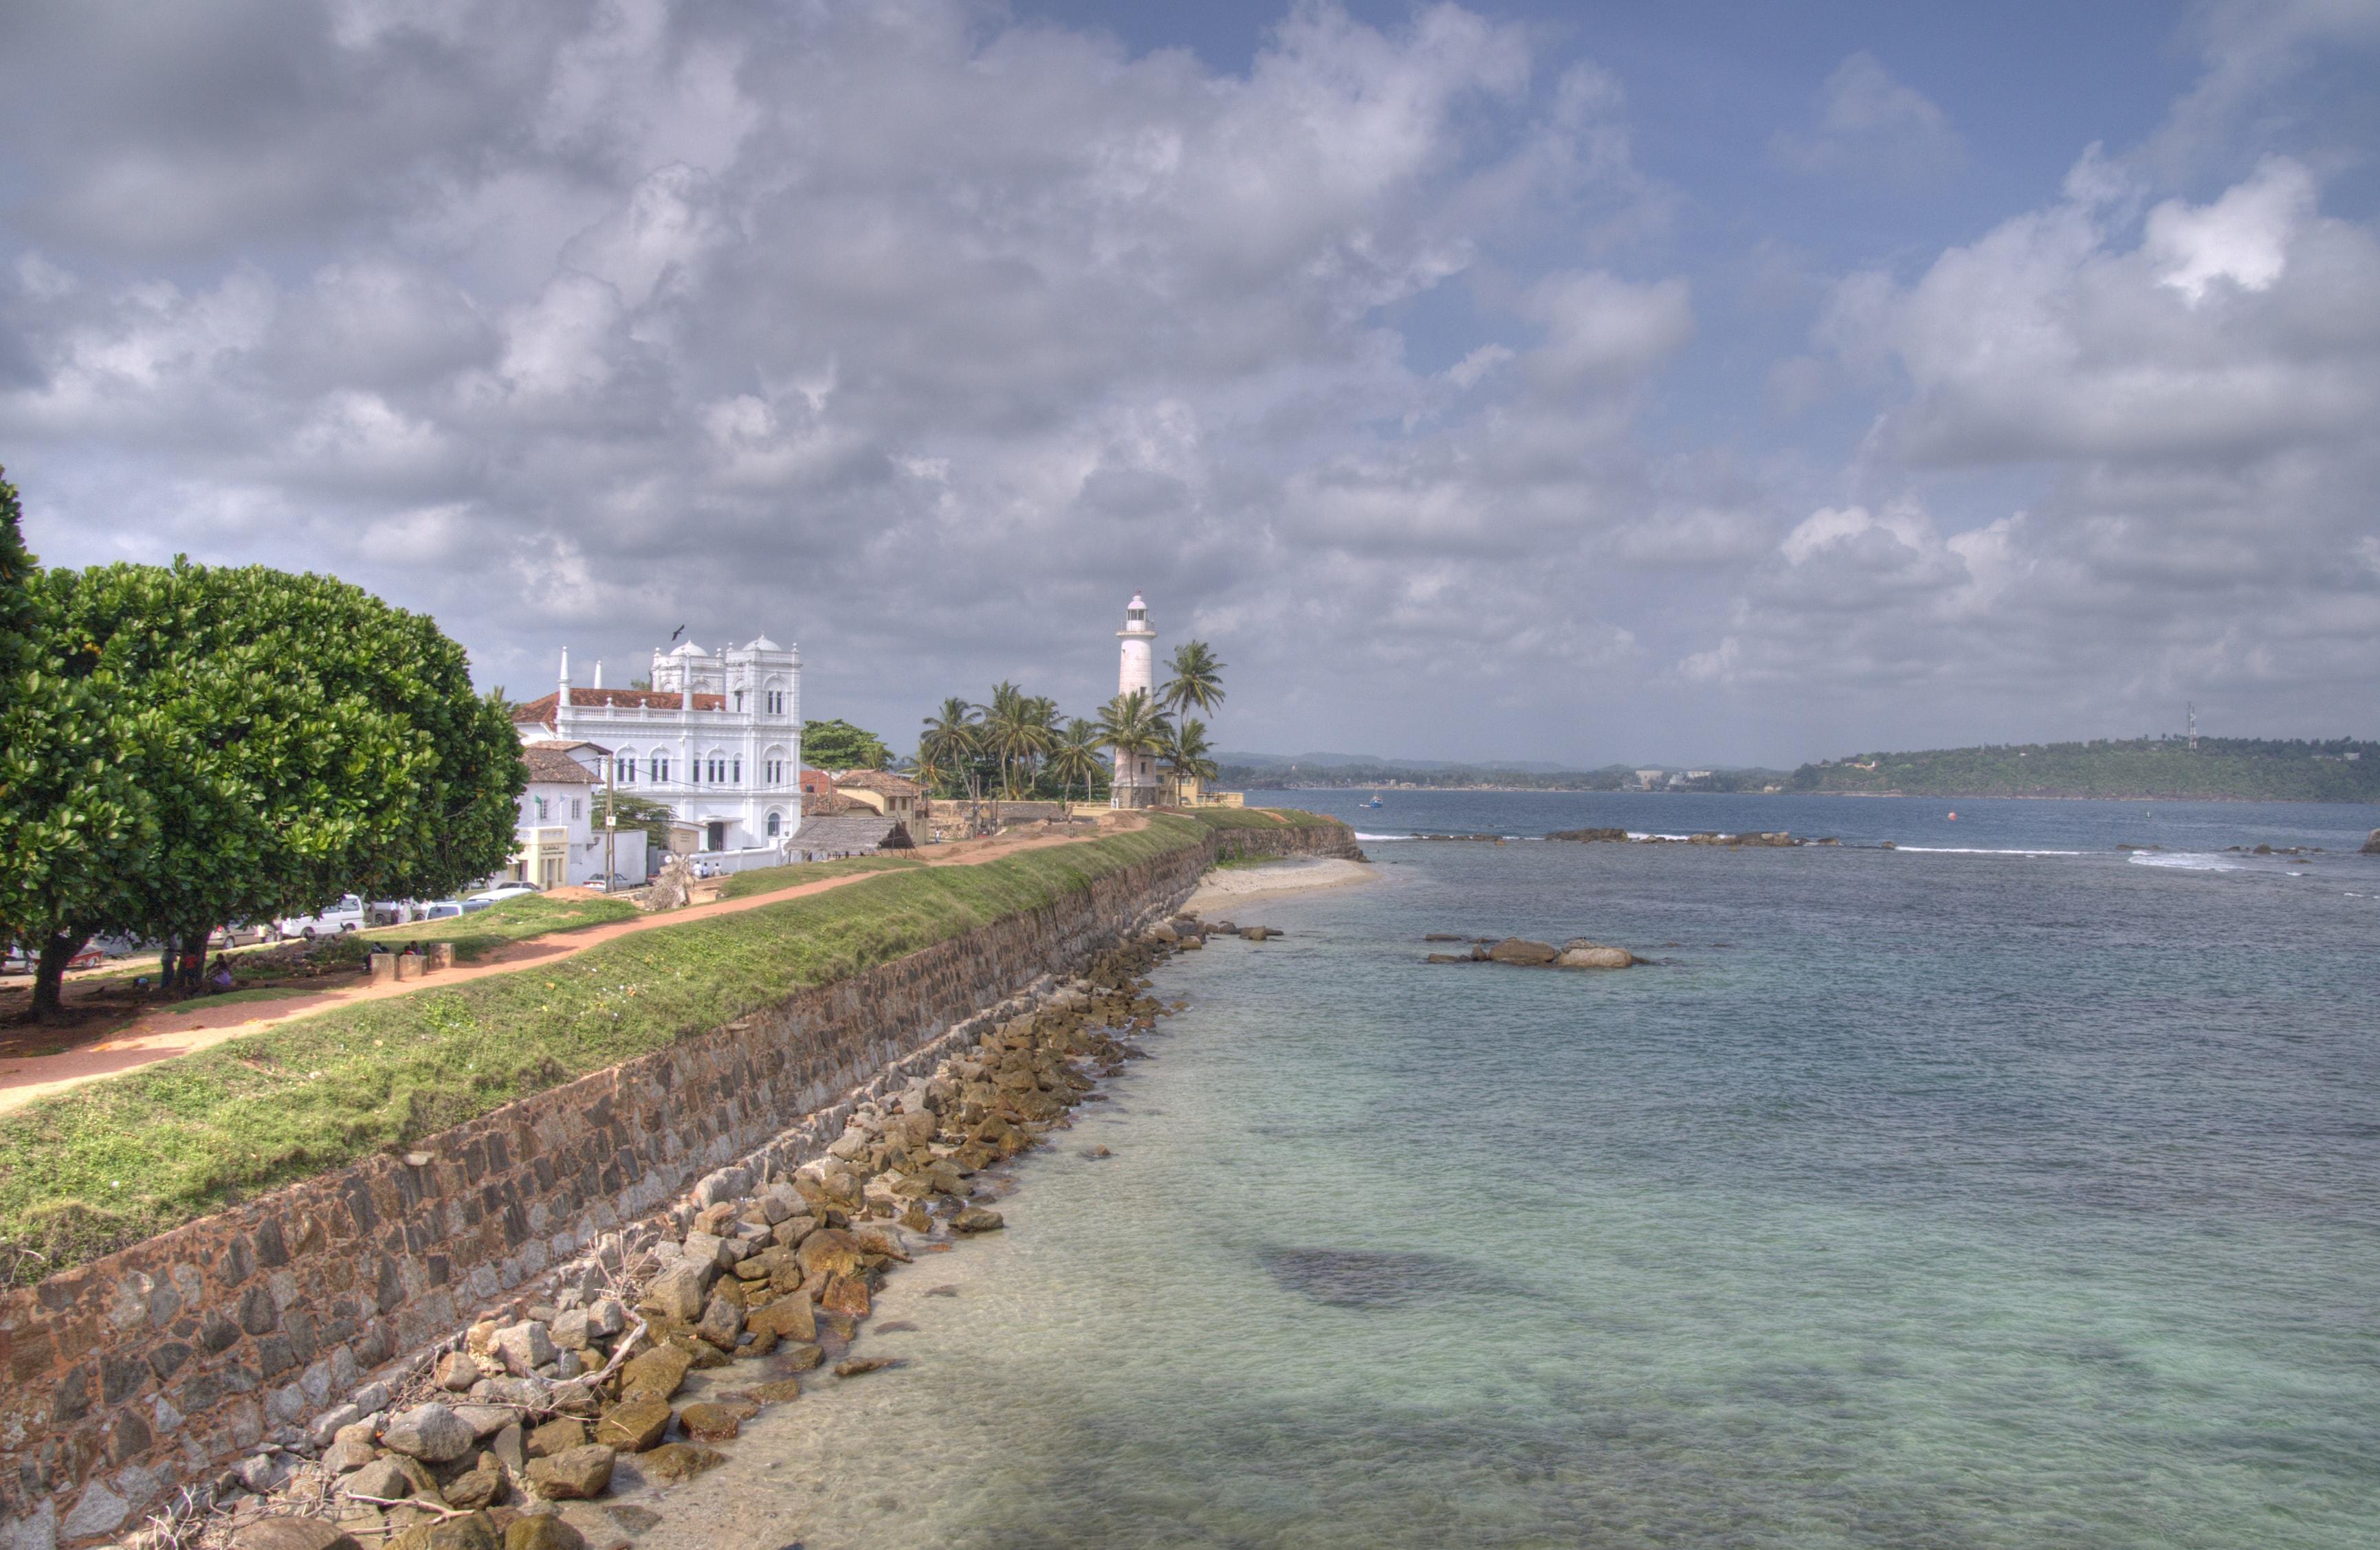 Sri Lanka tourist spots, Galle